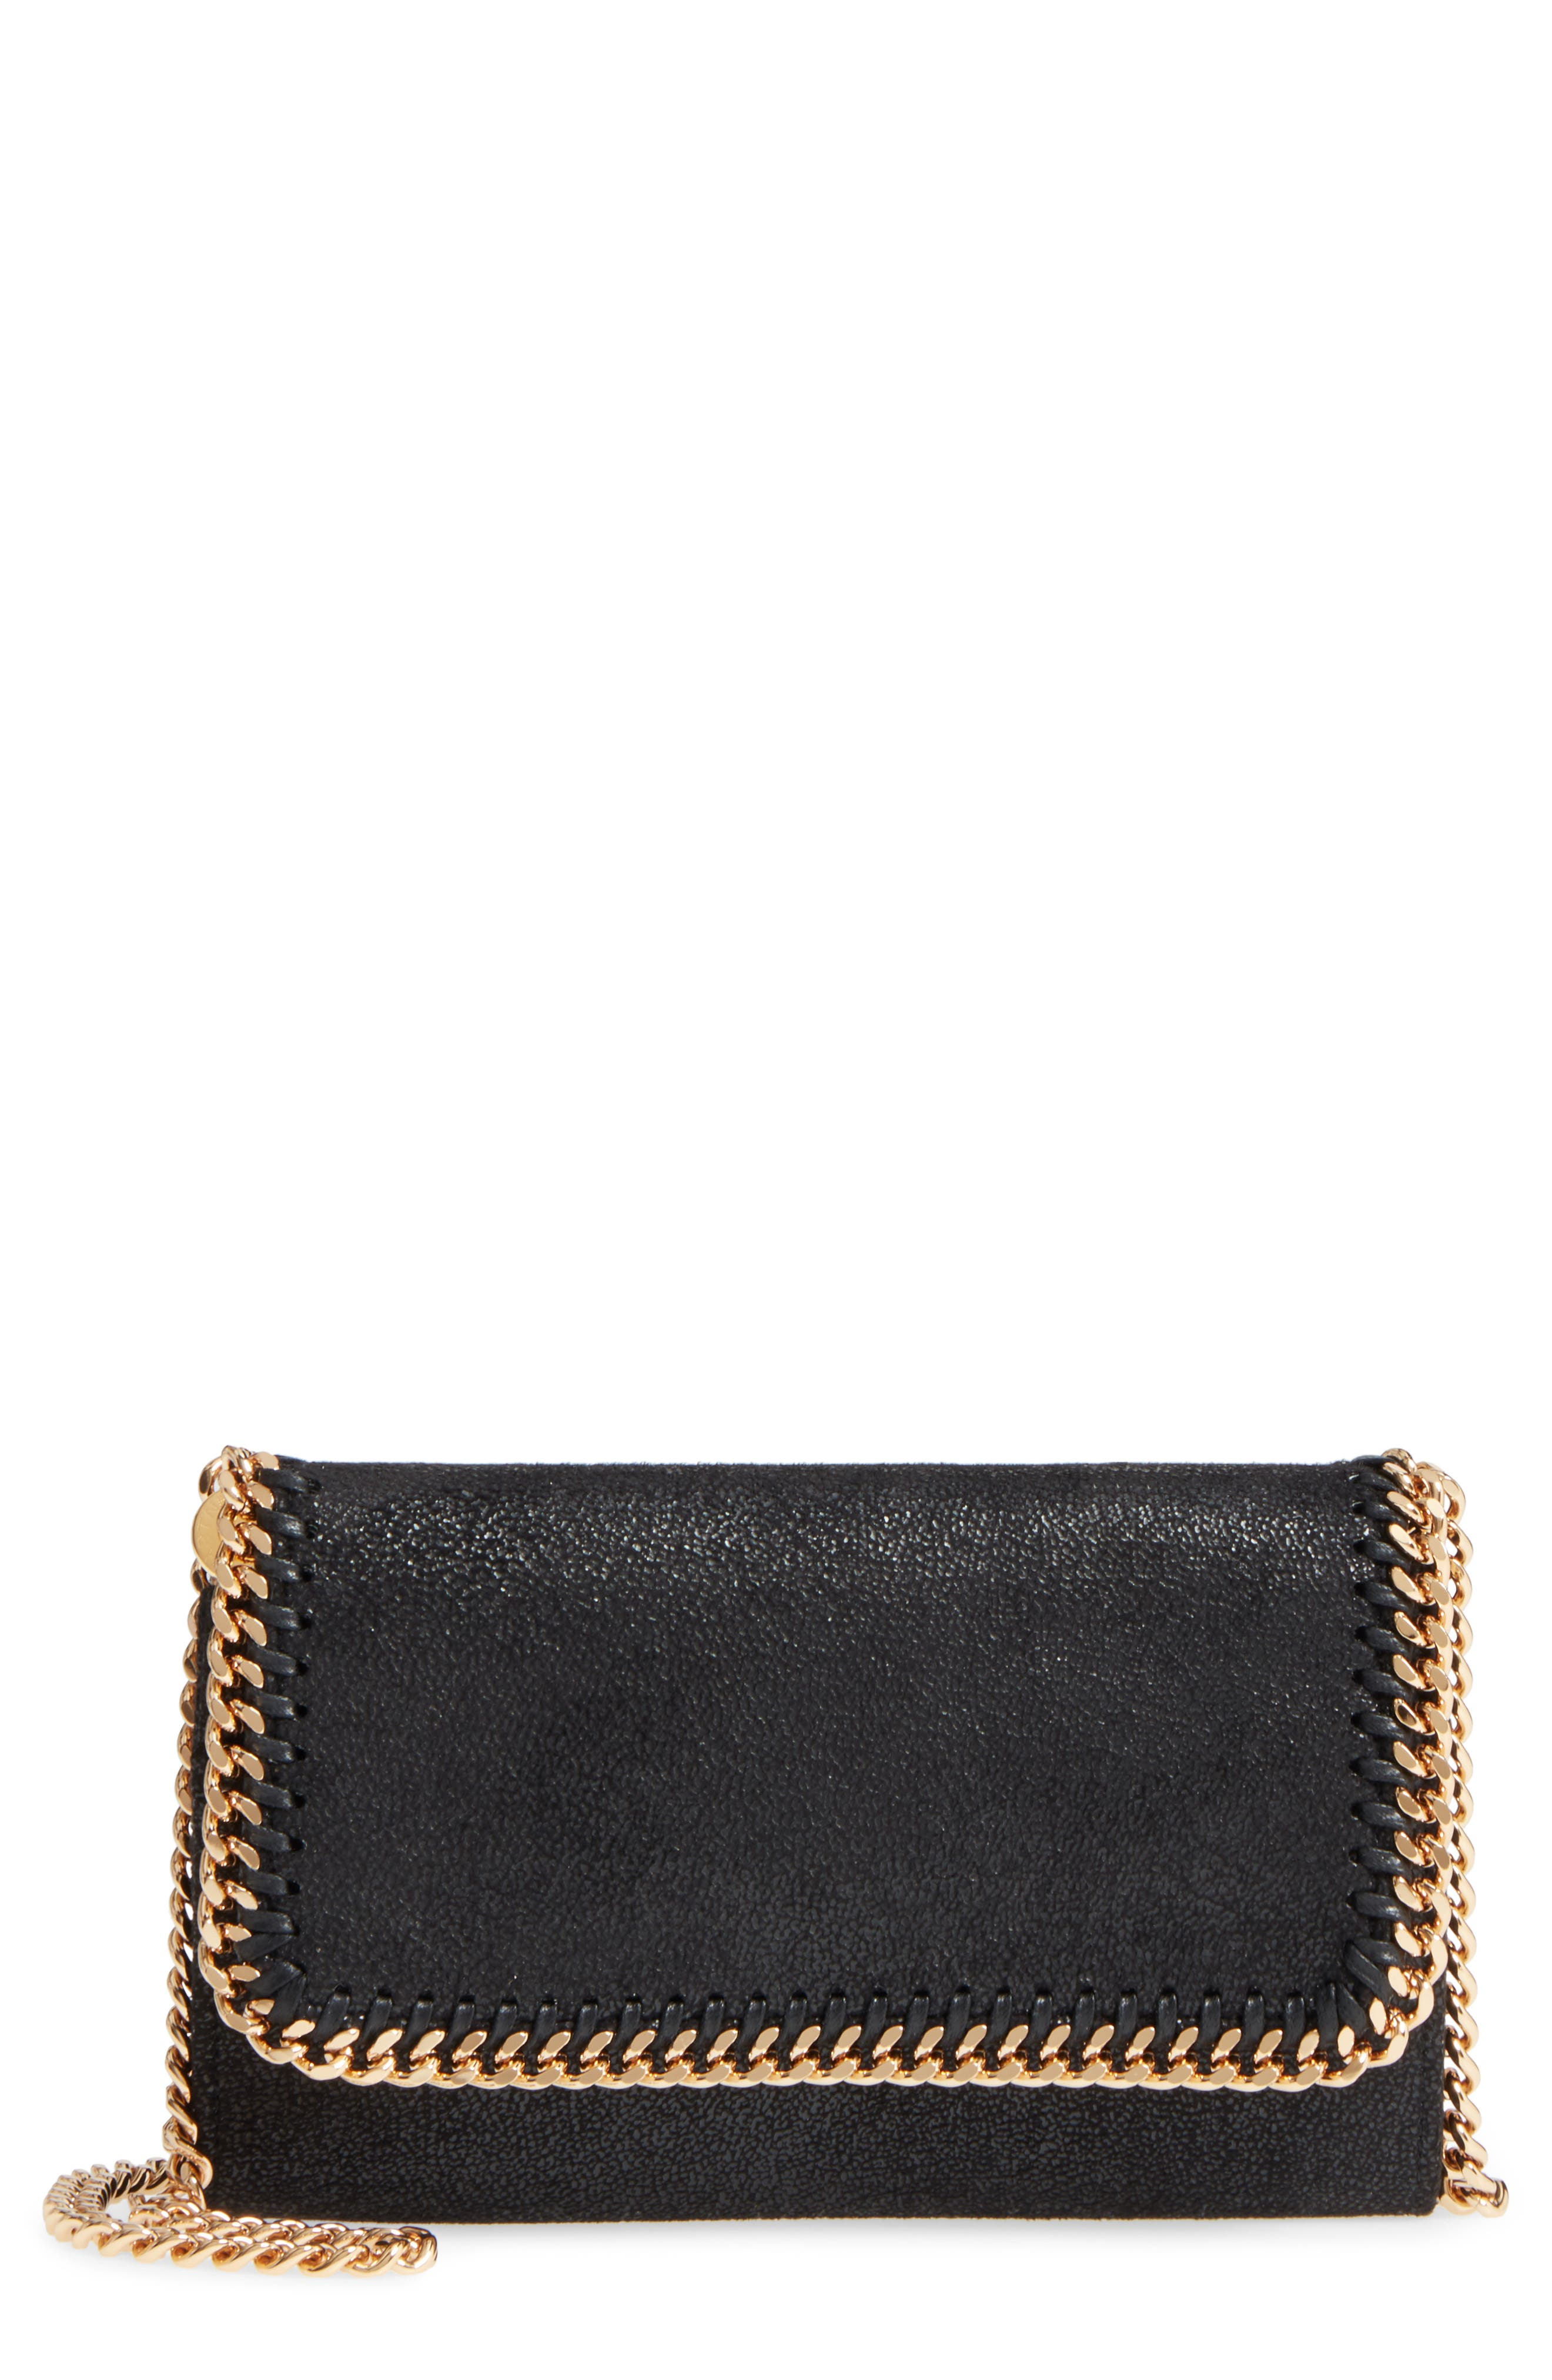 STELLA MCCARTNEY,                             Shaggy Deer Faux Leather Crossbody Bag,                             Main thumbnail 1, color,                             BLACK